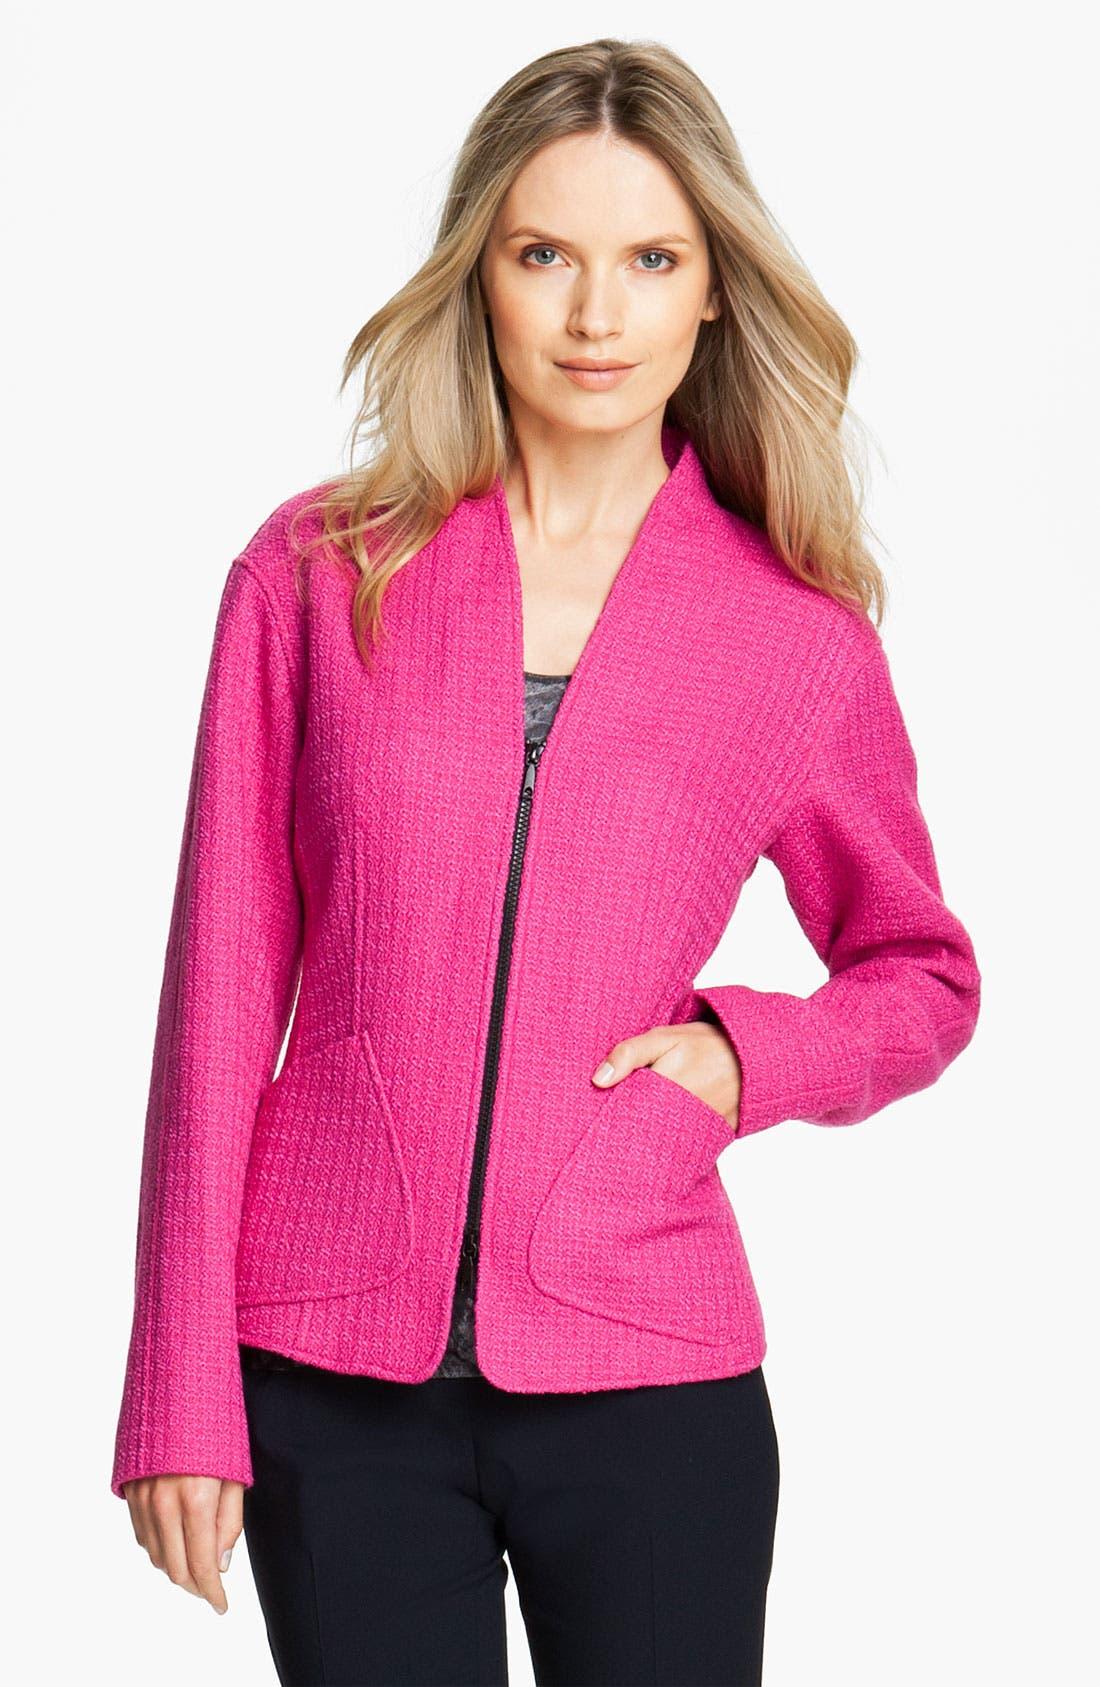 Alternate Image 1 Selected - Lafayette 148 New York 'Patricia Abbey Tweed' Jacket